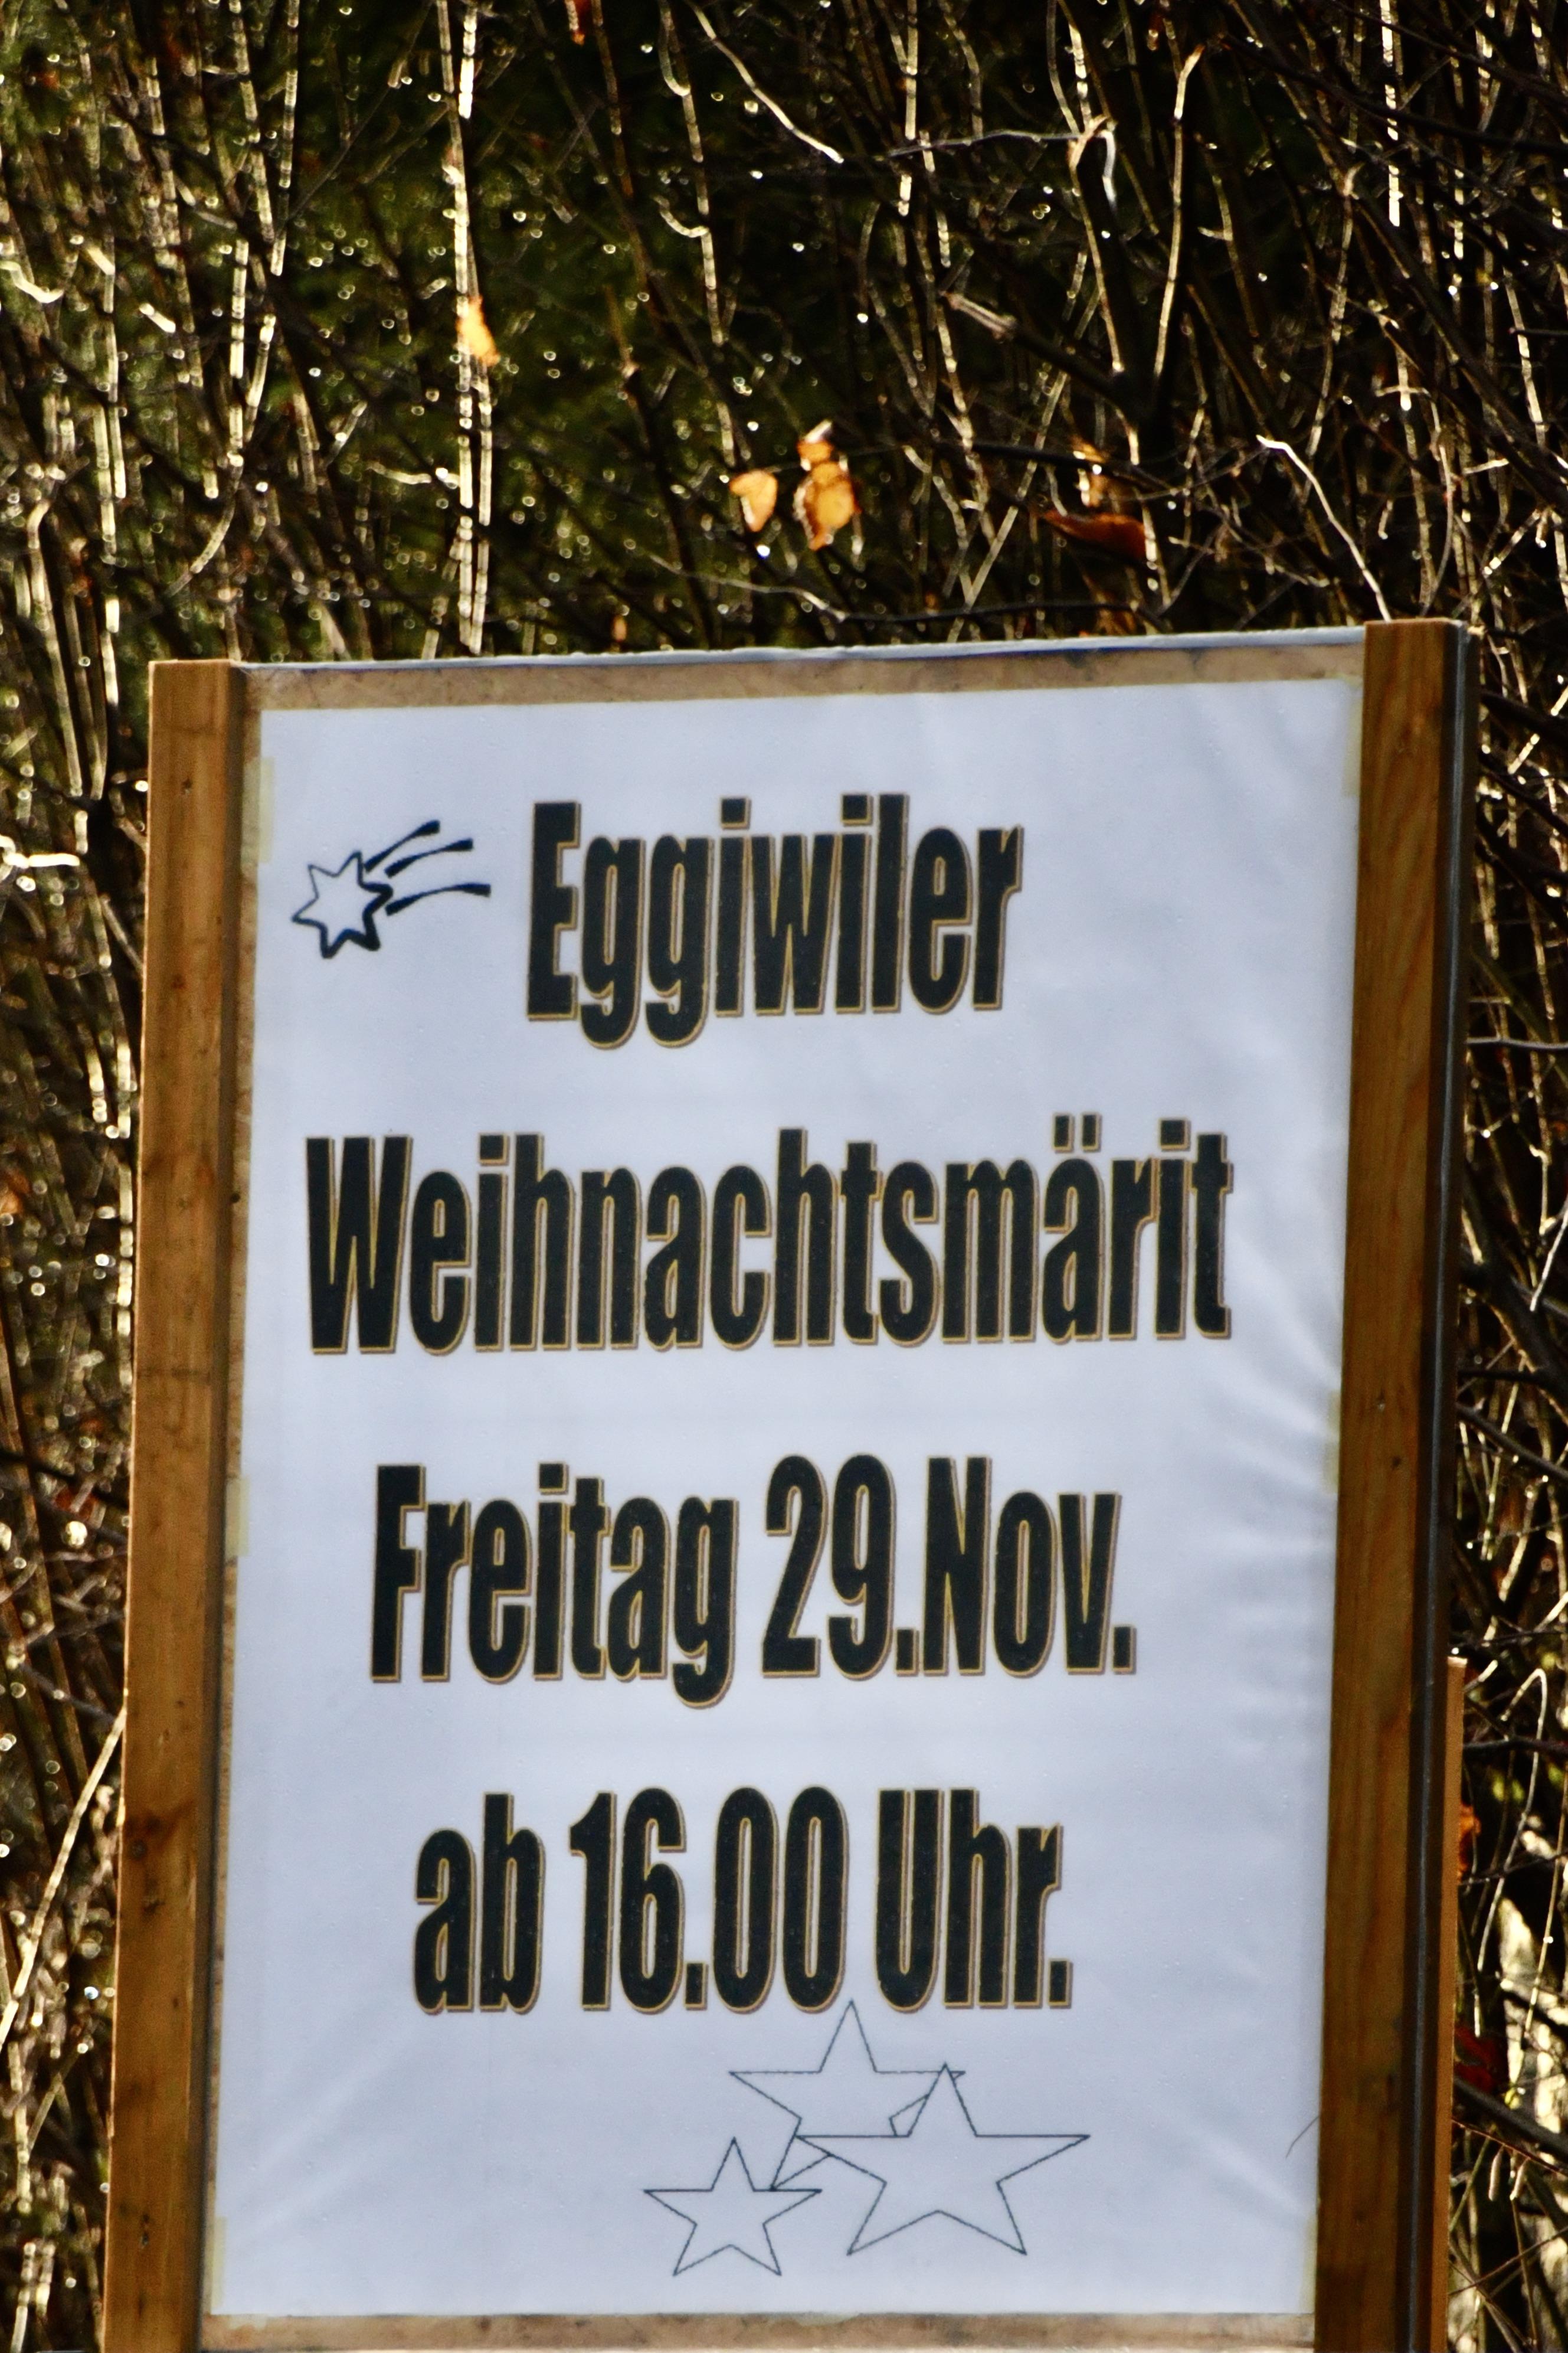 Weihnachtsmärit Eggiwil 29.11.2019